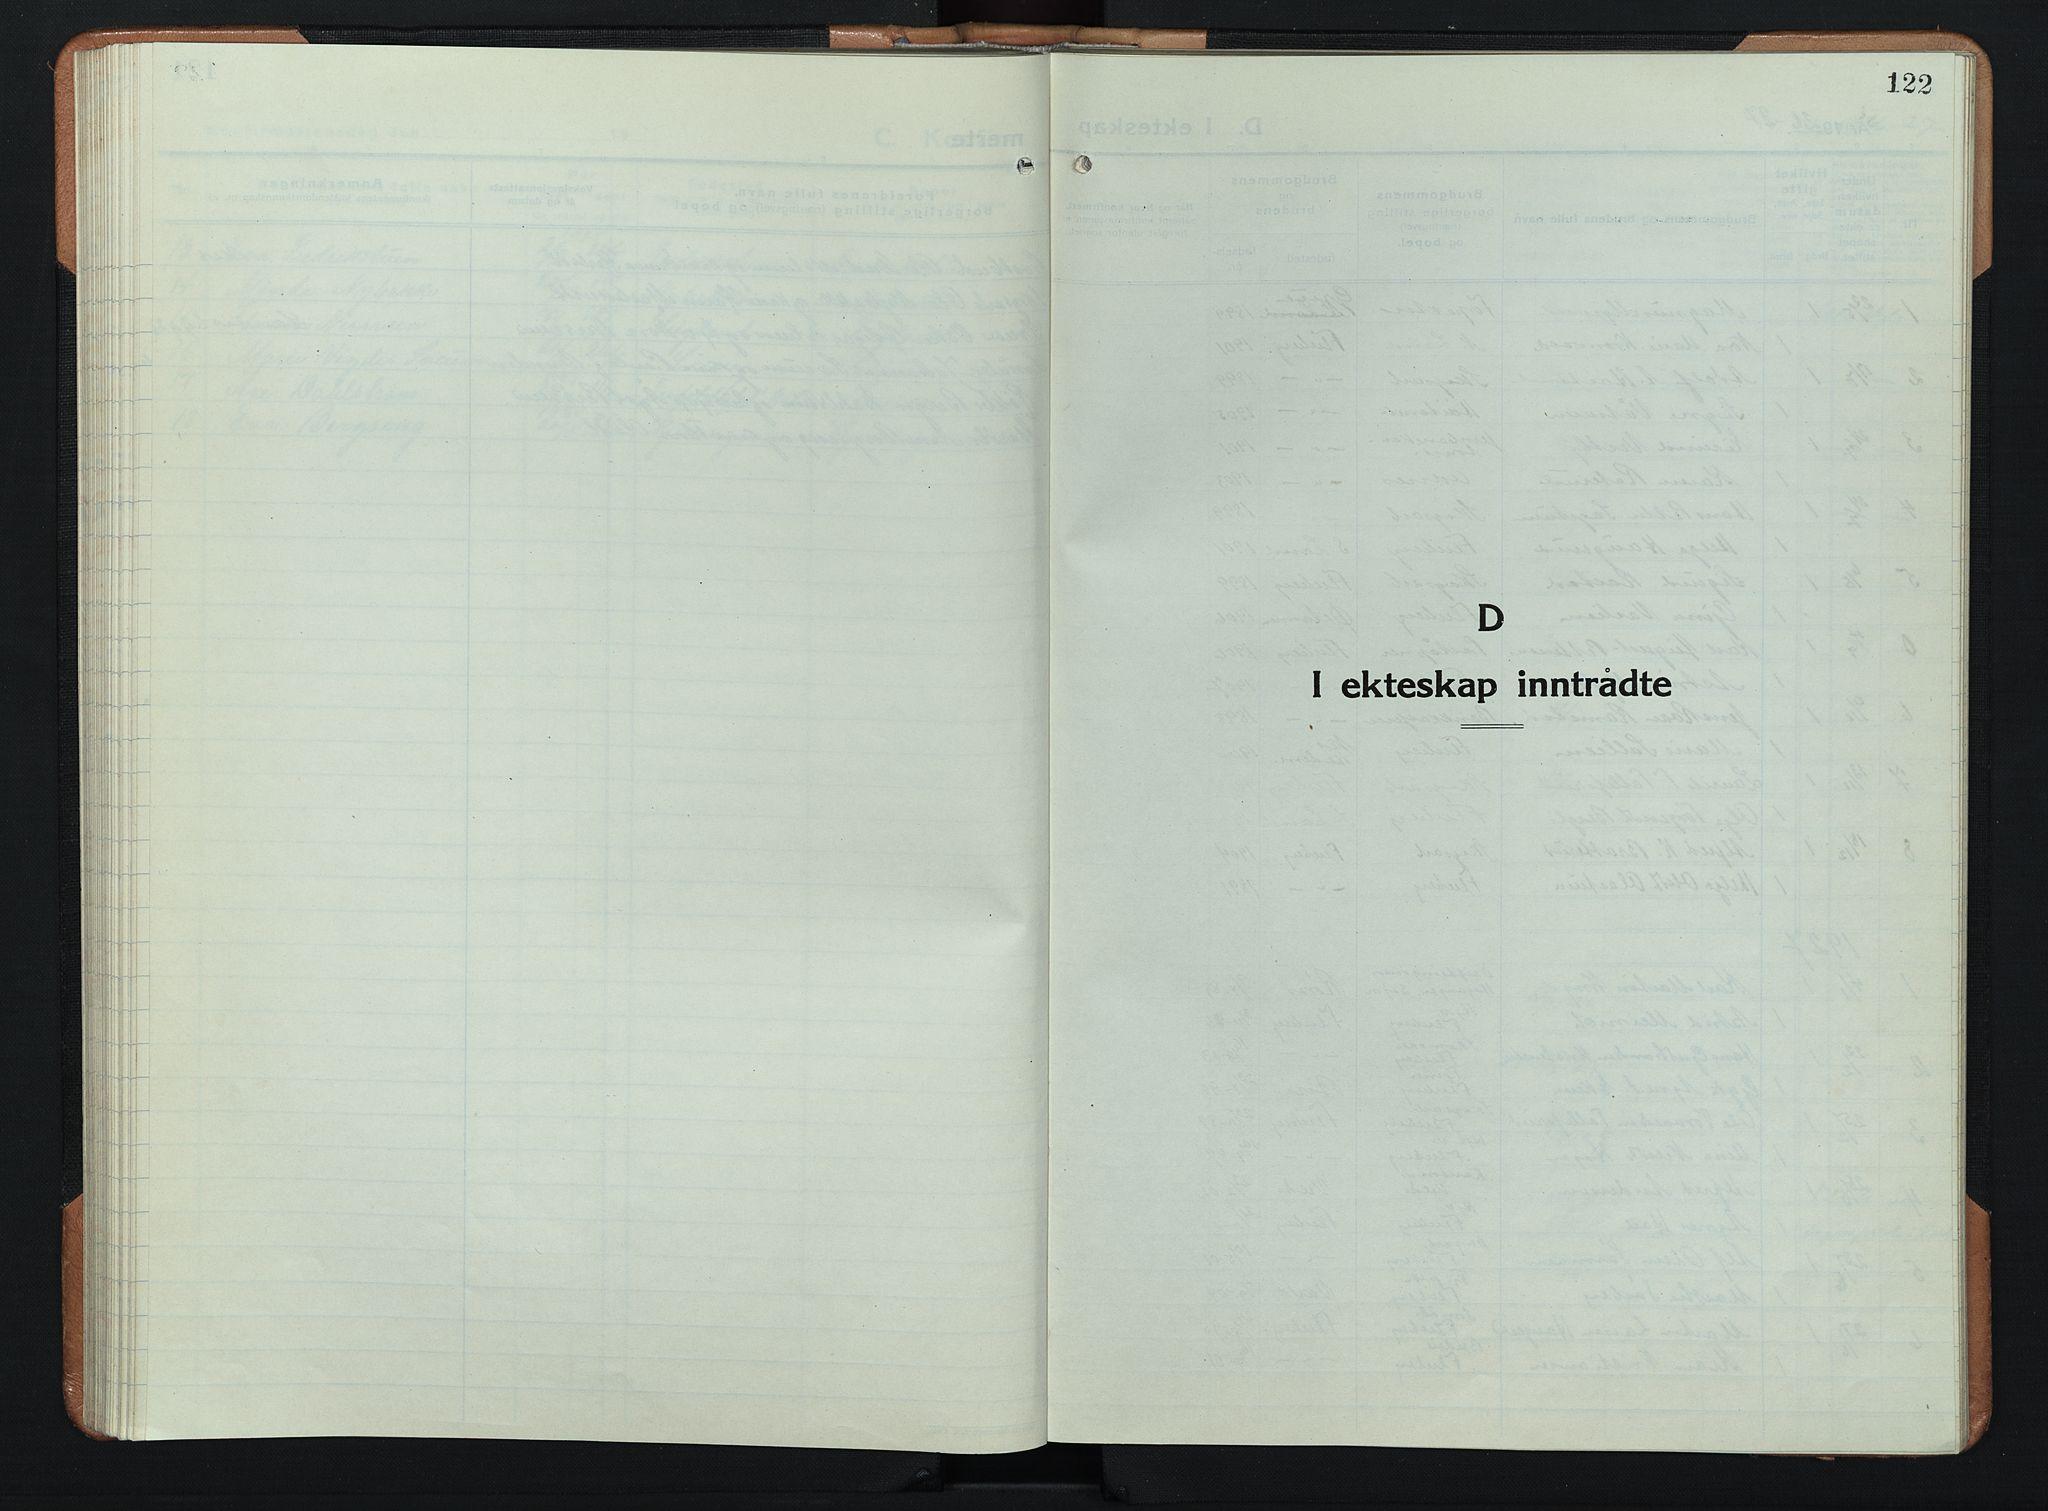 SAH, Søndre Land prestekontor, L/L0008: Klokkerbok nr. 8, 1926-1950, s. 122